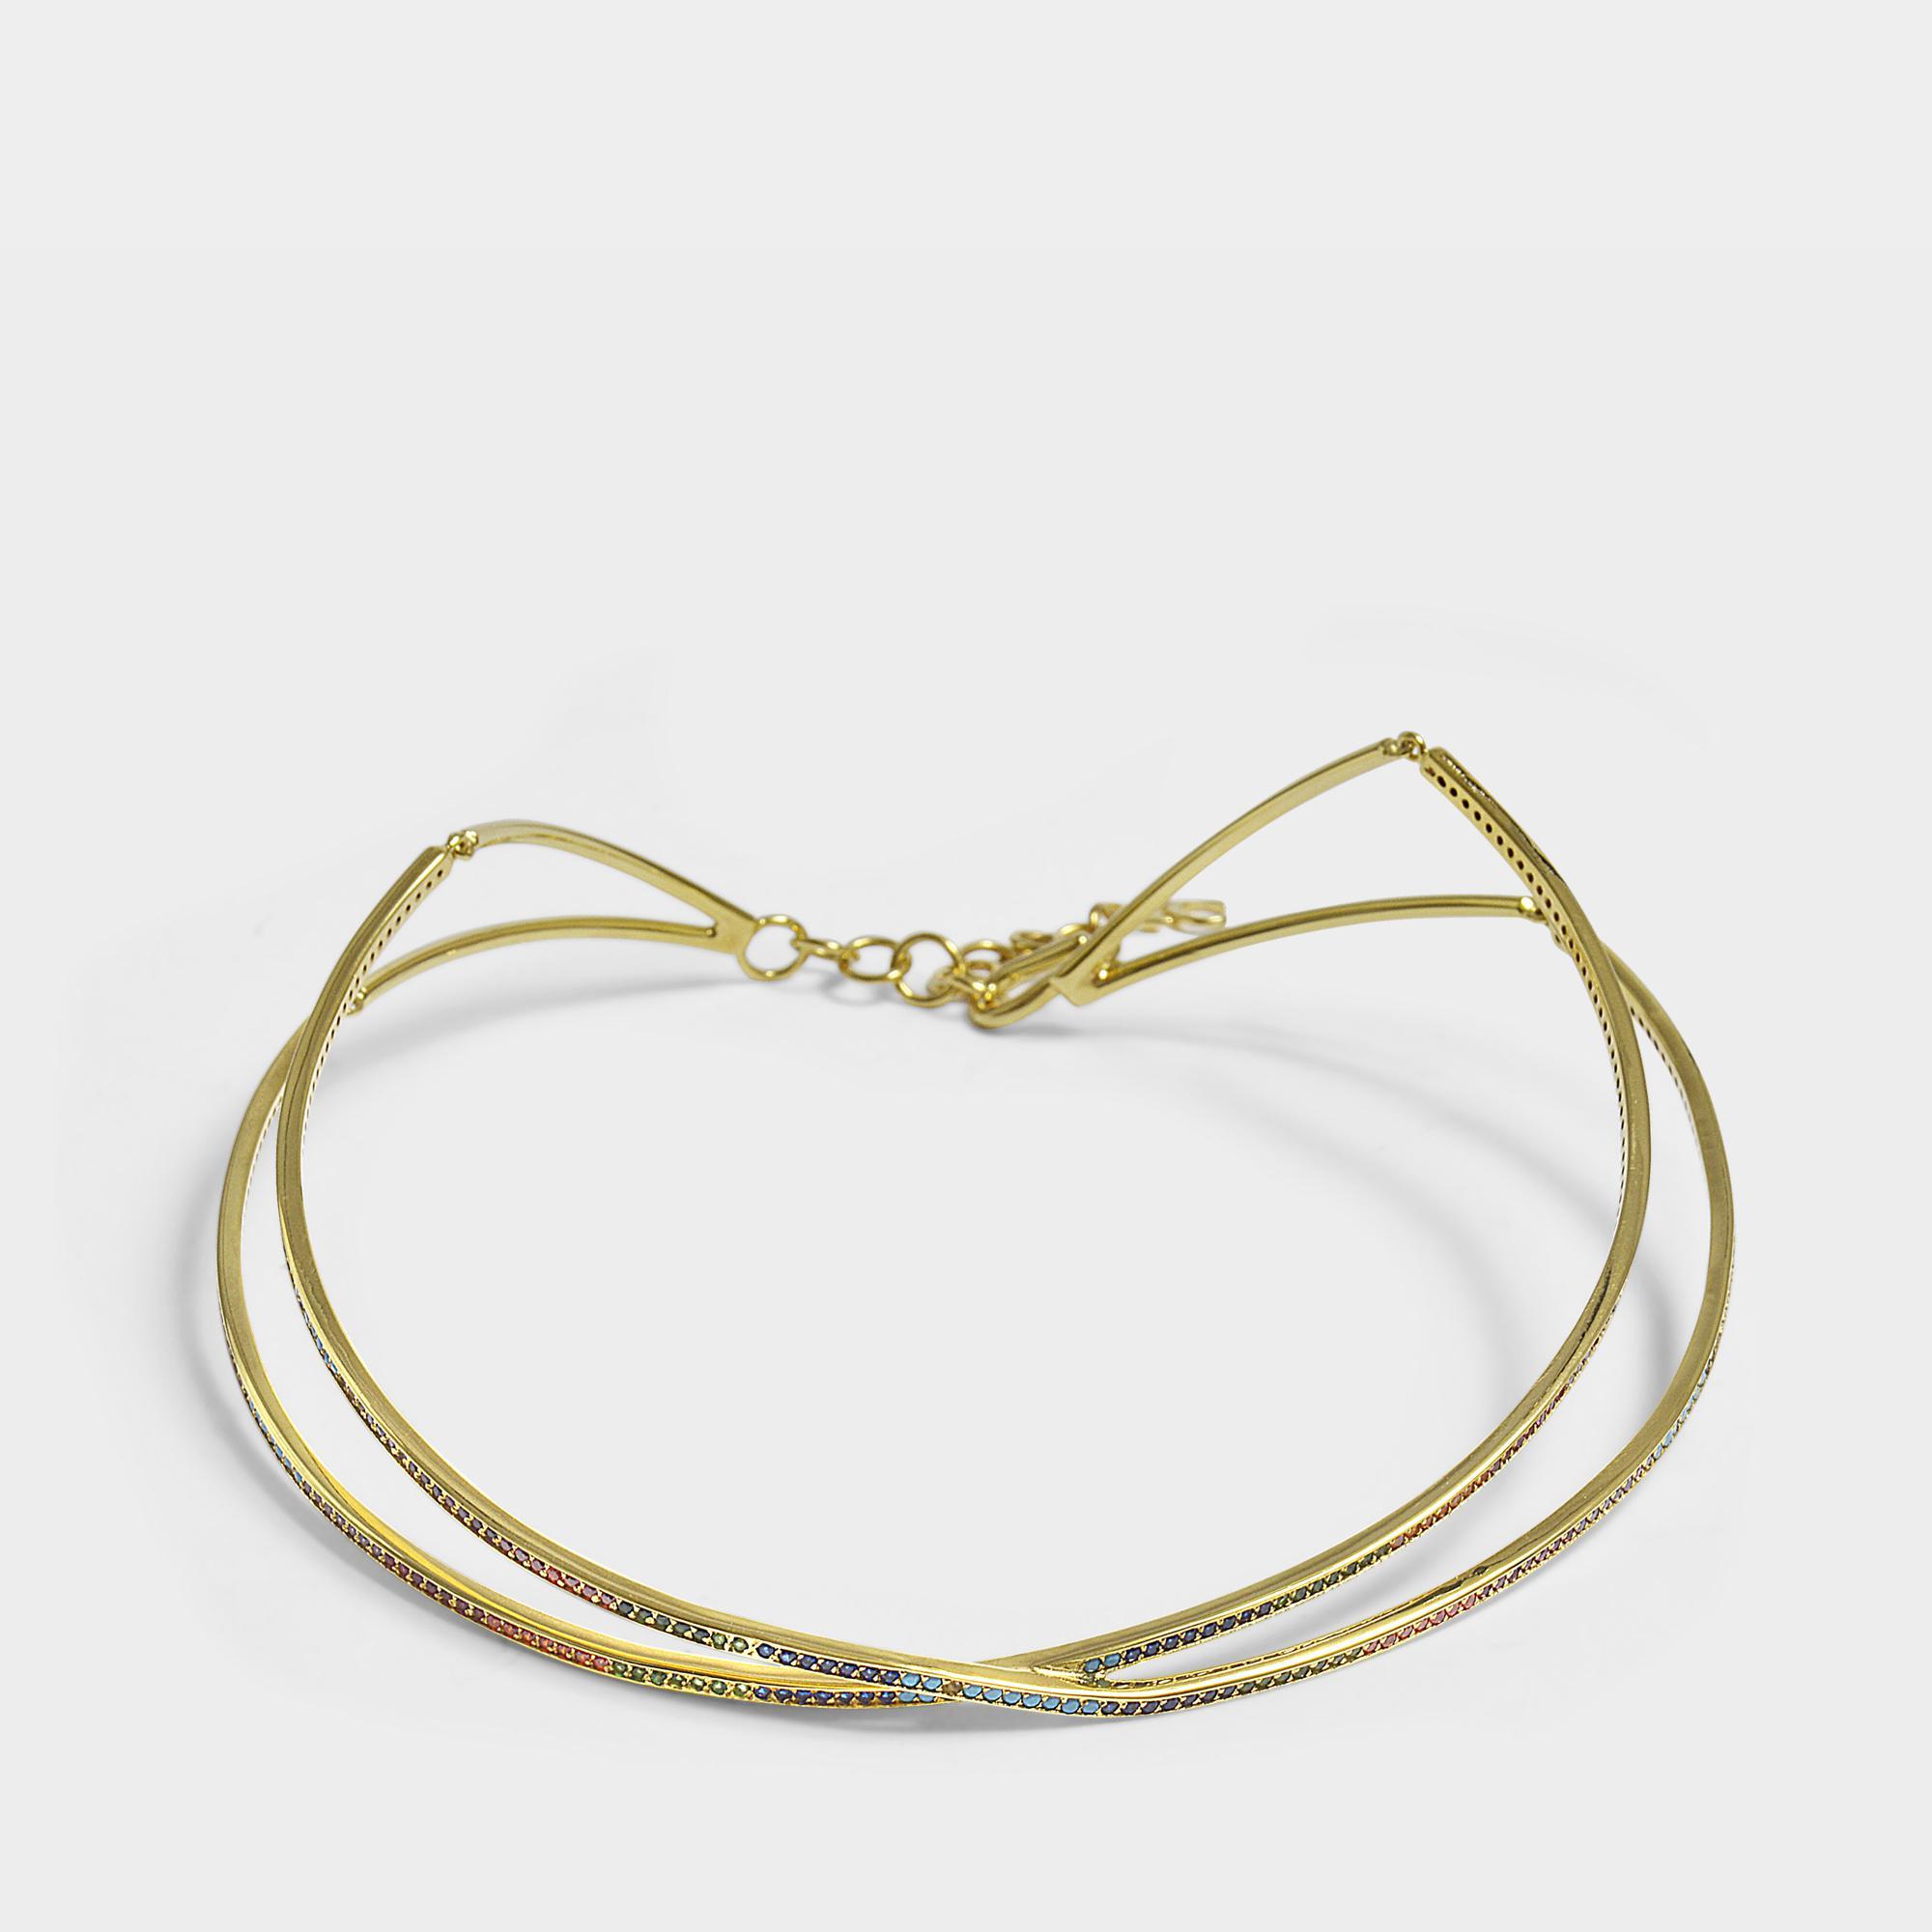 Lyst - Joanna Laura Constantine Criss Cross Choker Necklace In Multi ...